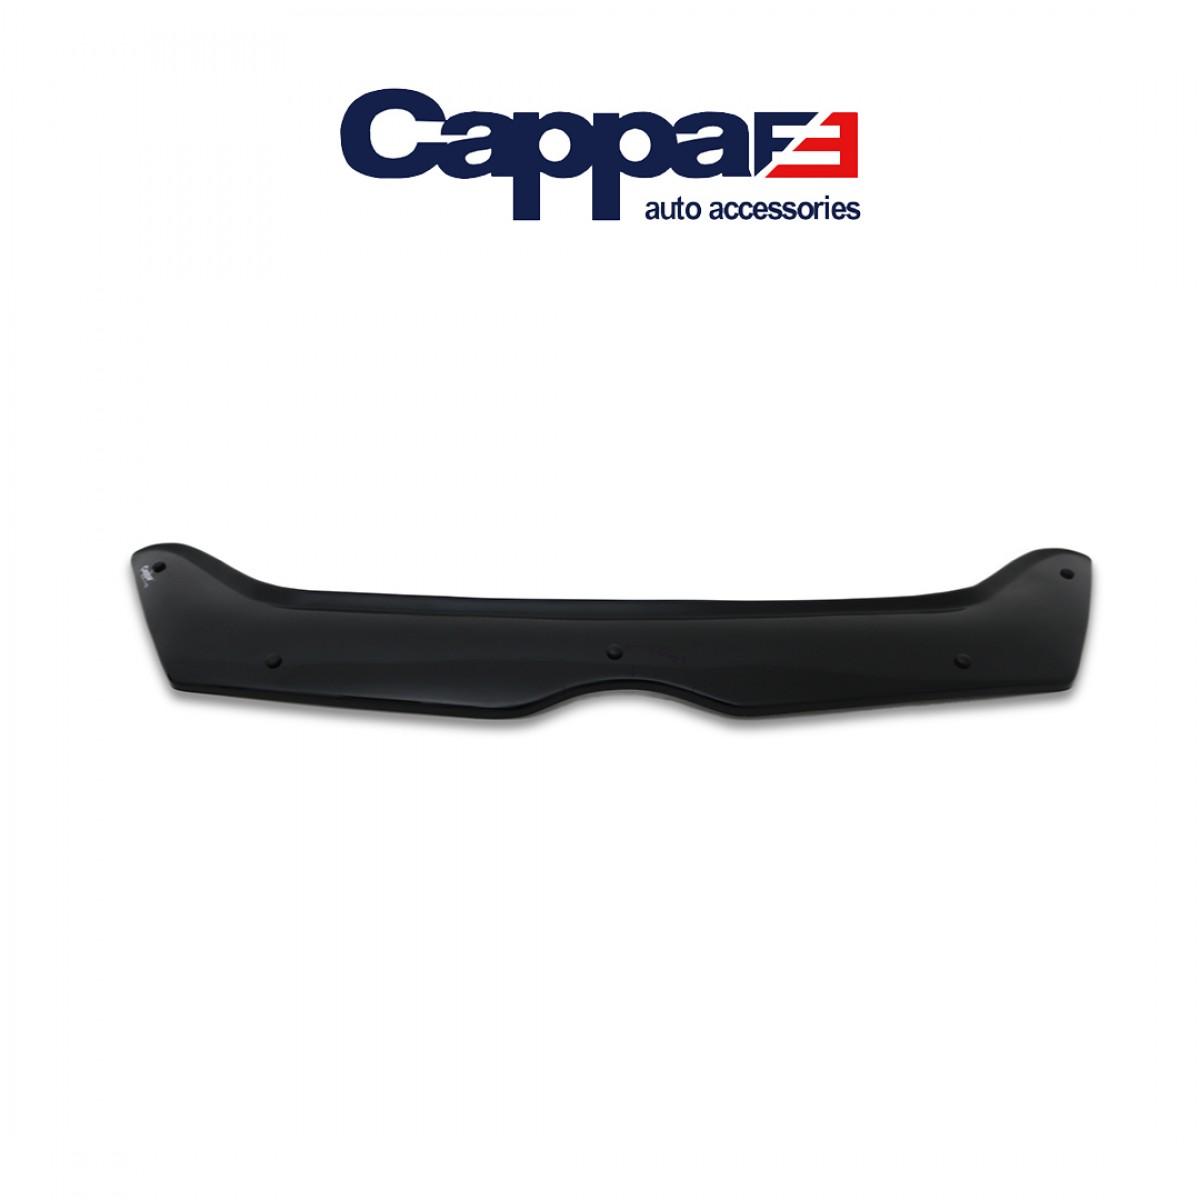 CAPPAFE Ford Fiesta Ön Kaput Koruma Rüzgarlığı 4mm ABS 2009-2012